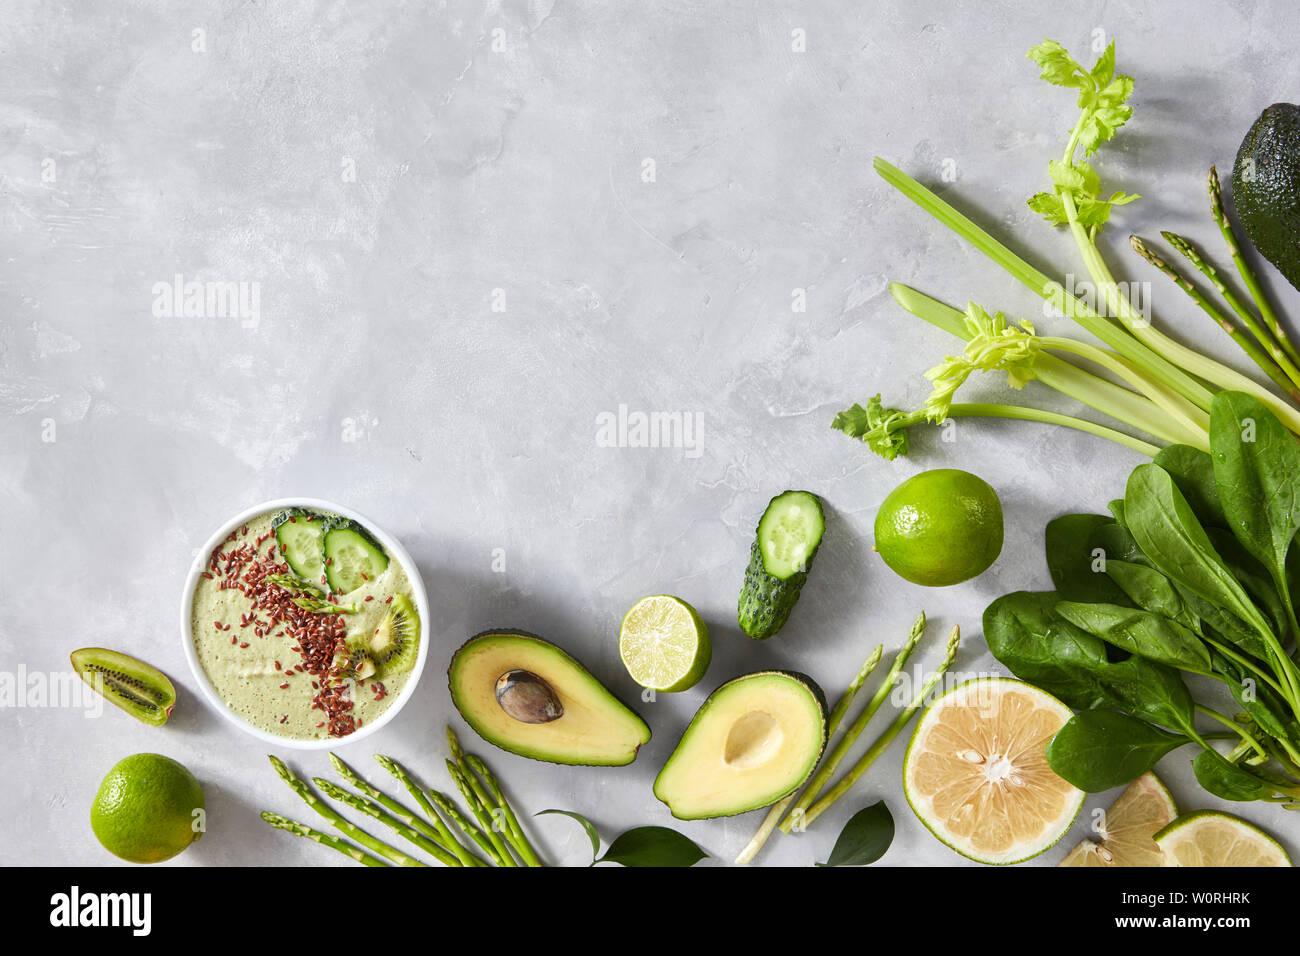 green smoothie - Stock Image